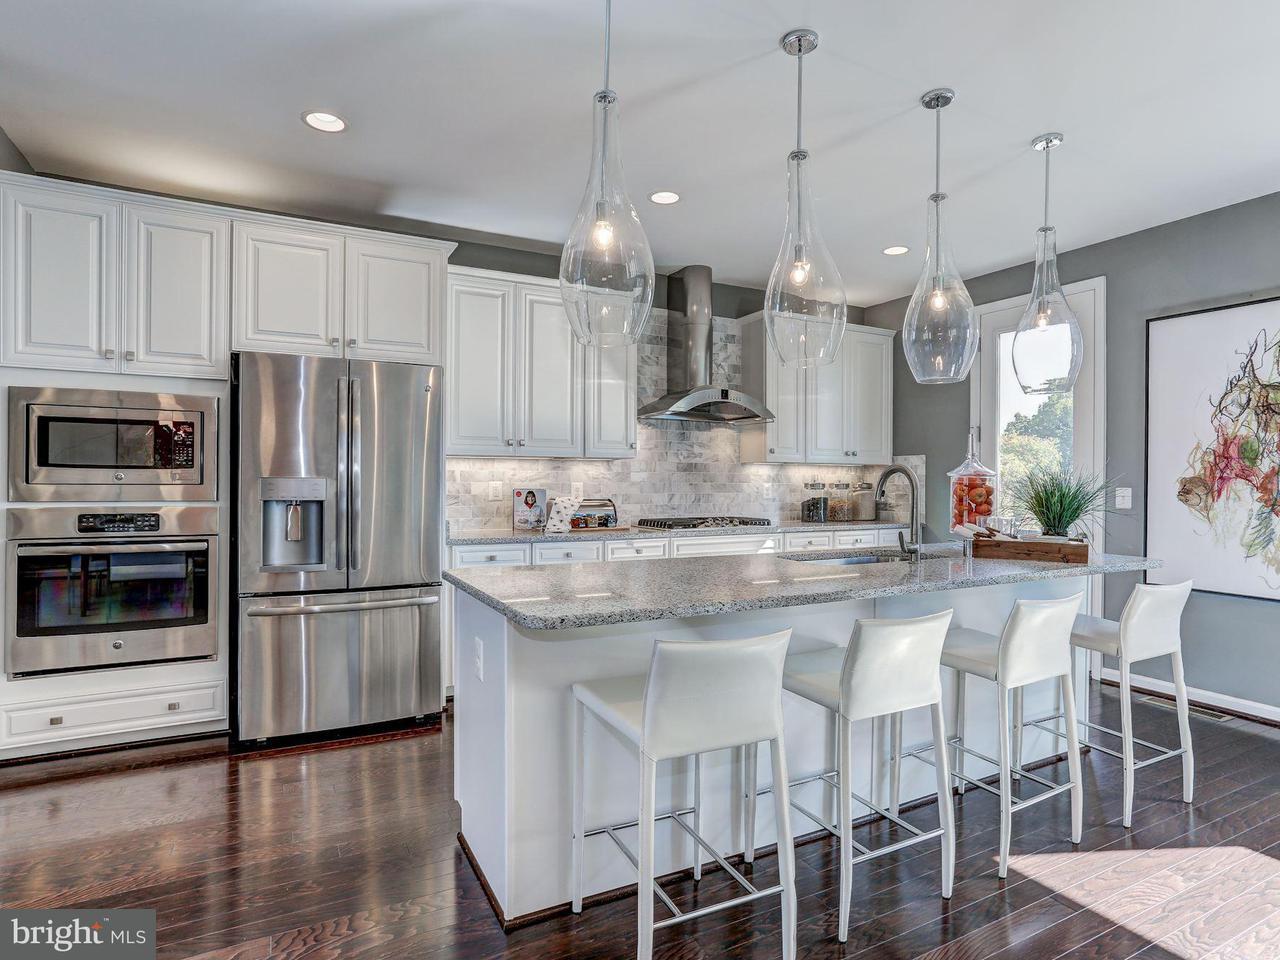 Таунхаус для того Продажа на 14598 LAKESTONE Drive 14598 LAKESTONE Drive Chantilly, Виргиния 20151 Соединенные Штаты